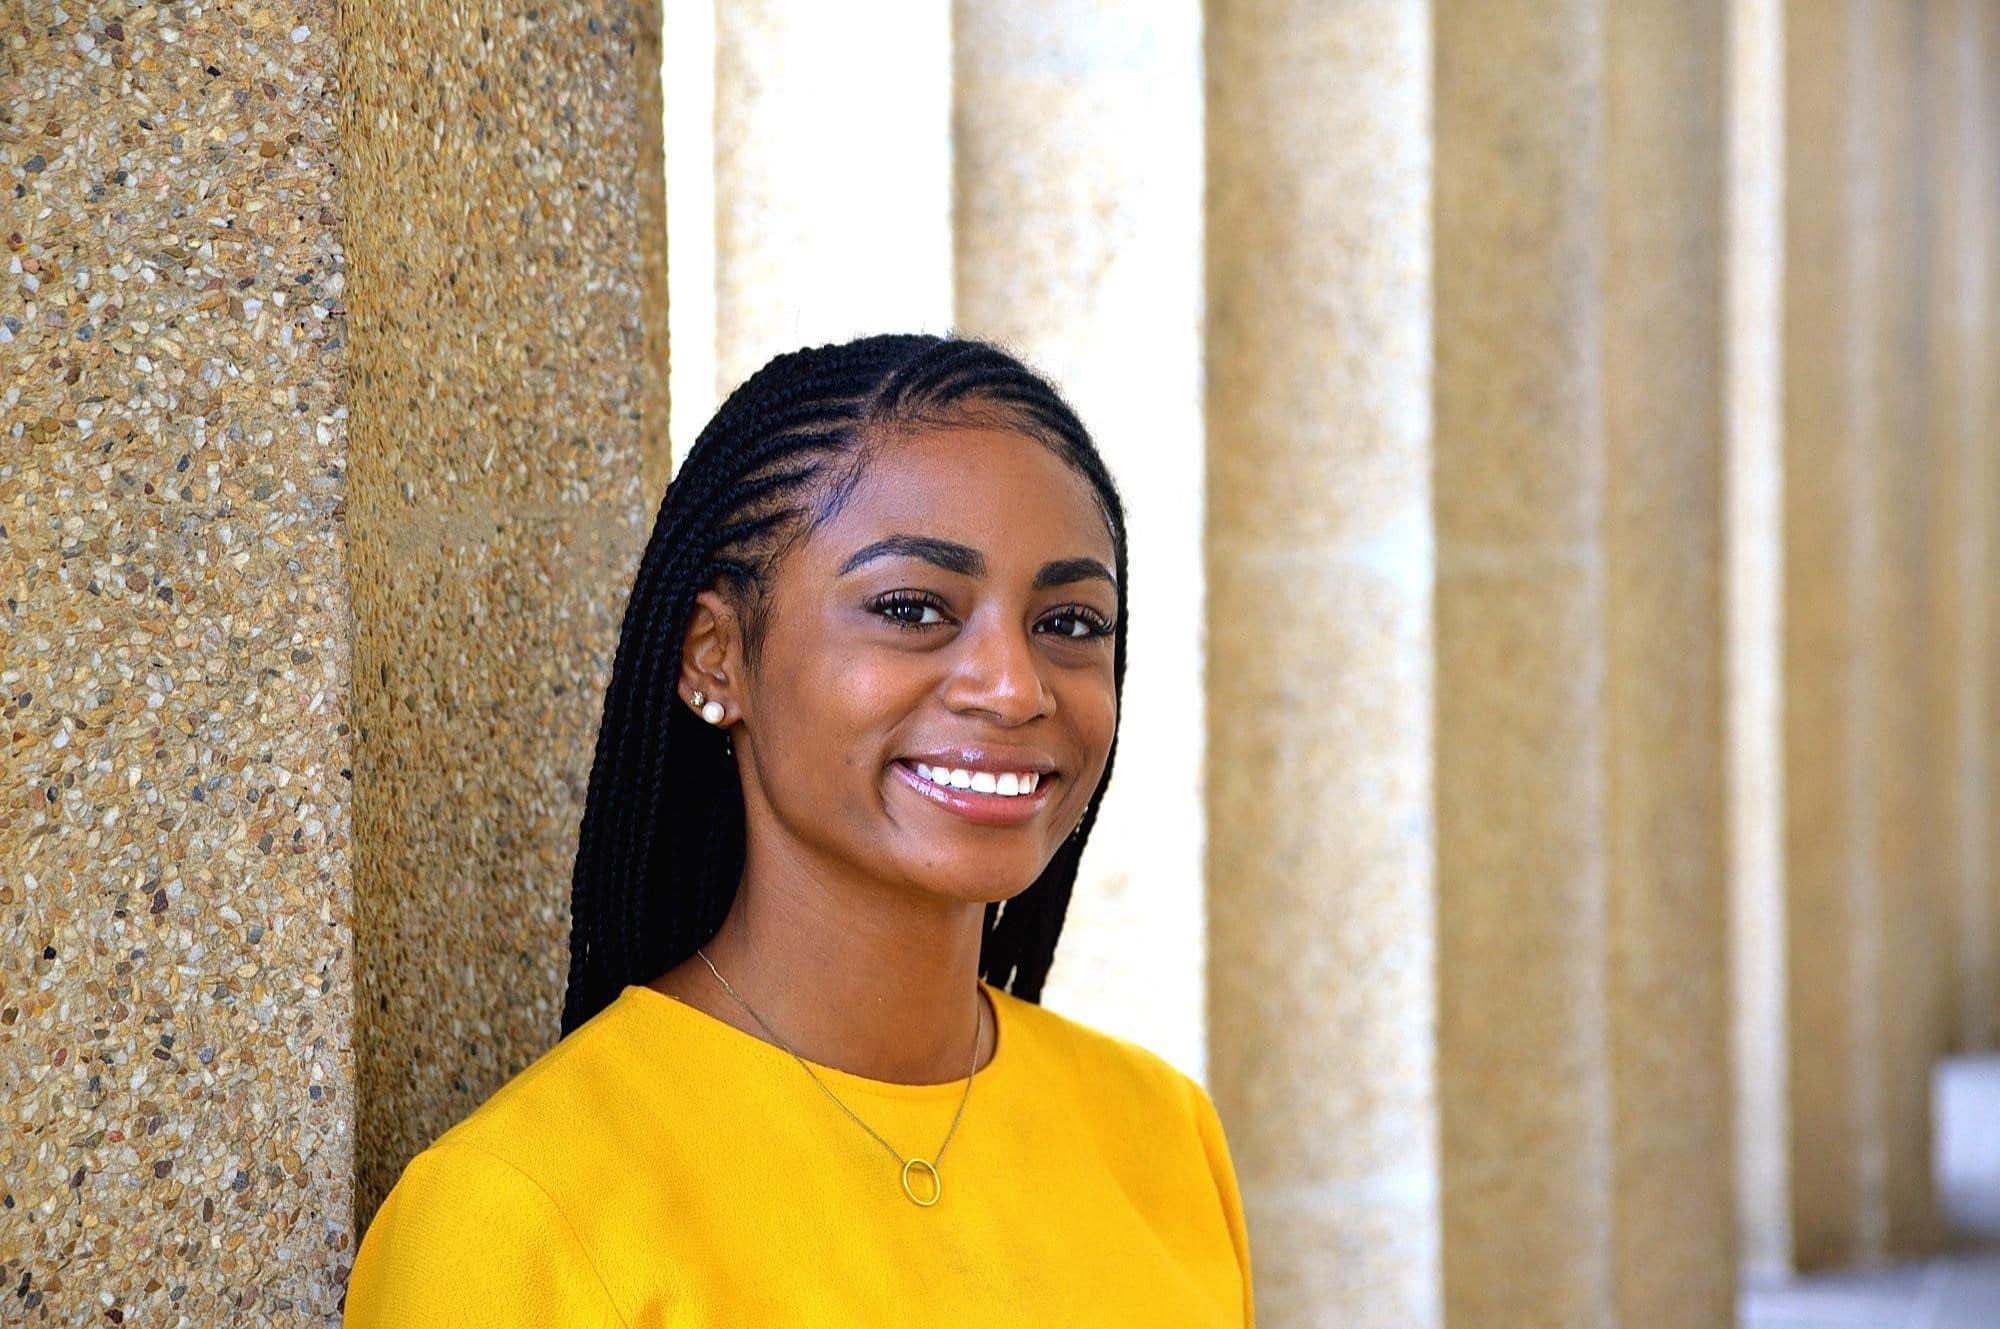 Tragos Law scholarship winner Taylor Avery